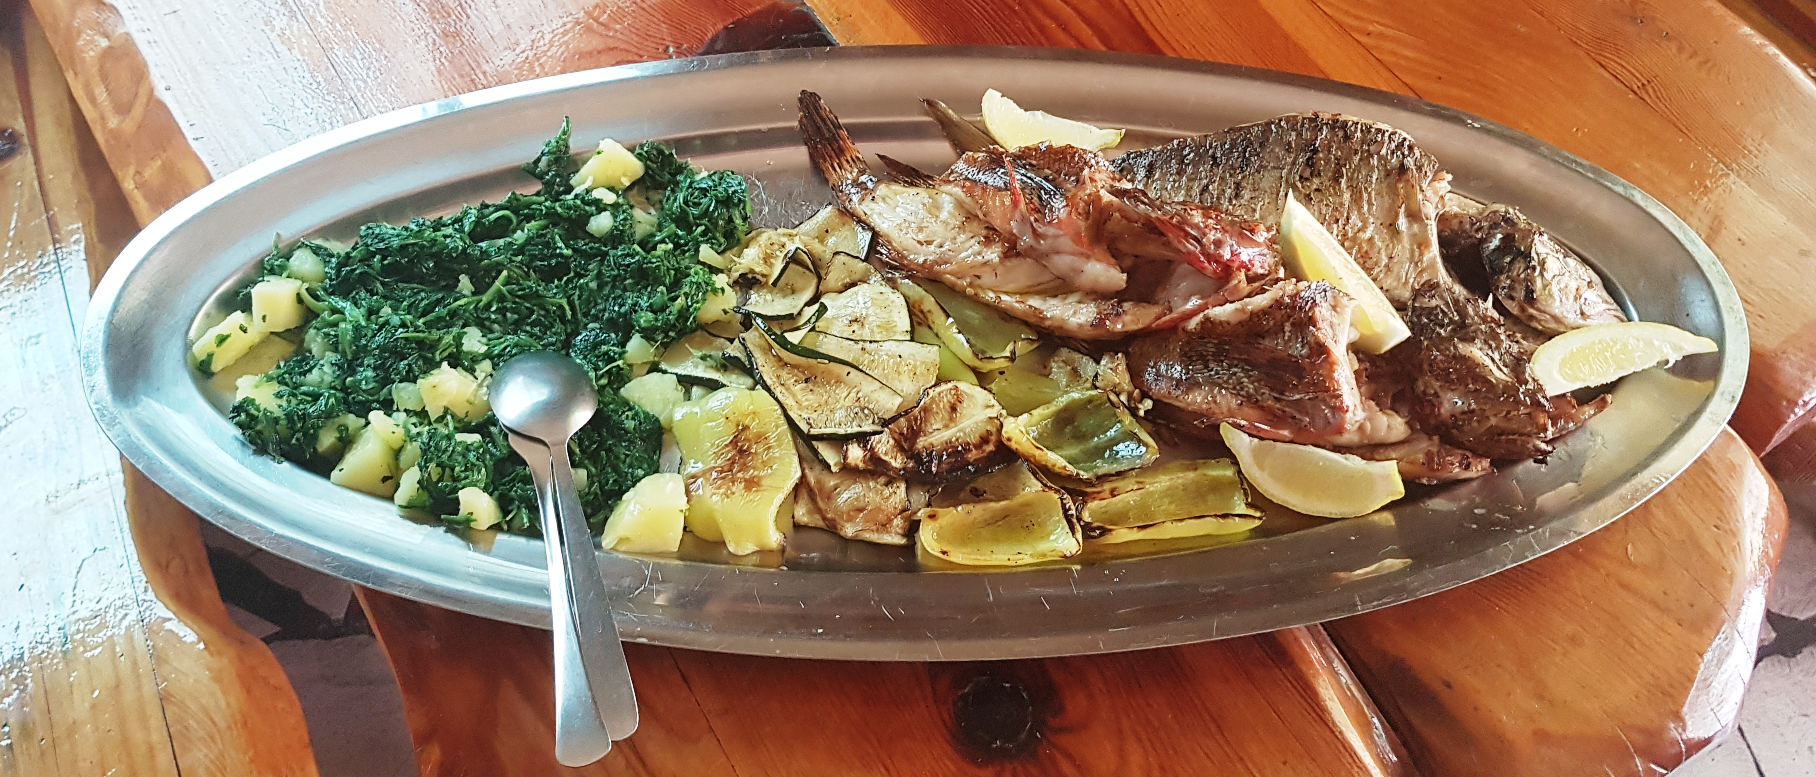 Croatian grilled fish recipes for Bbq fish recipes